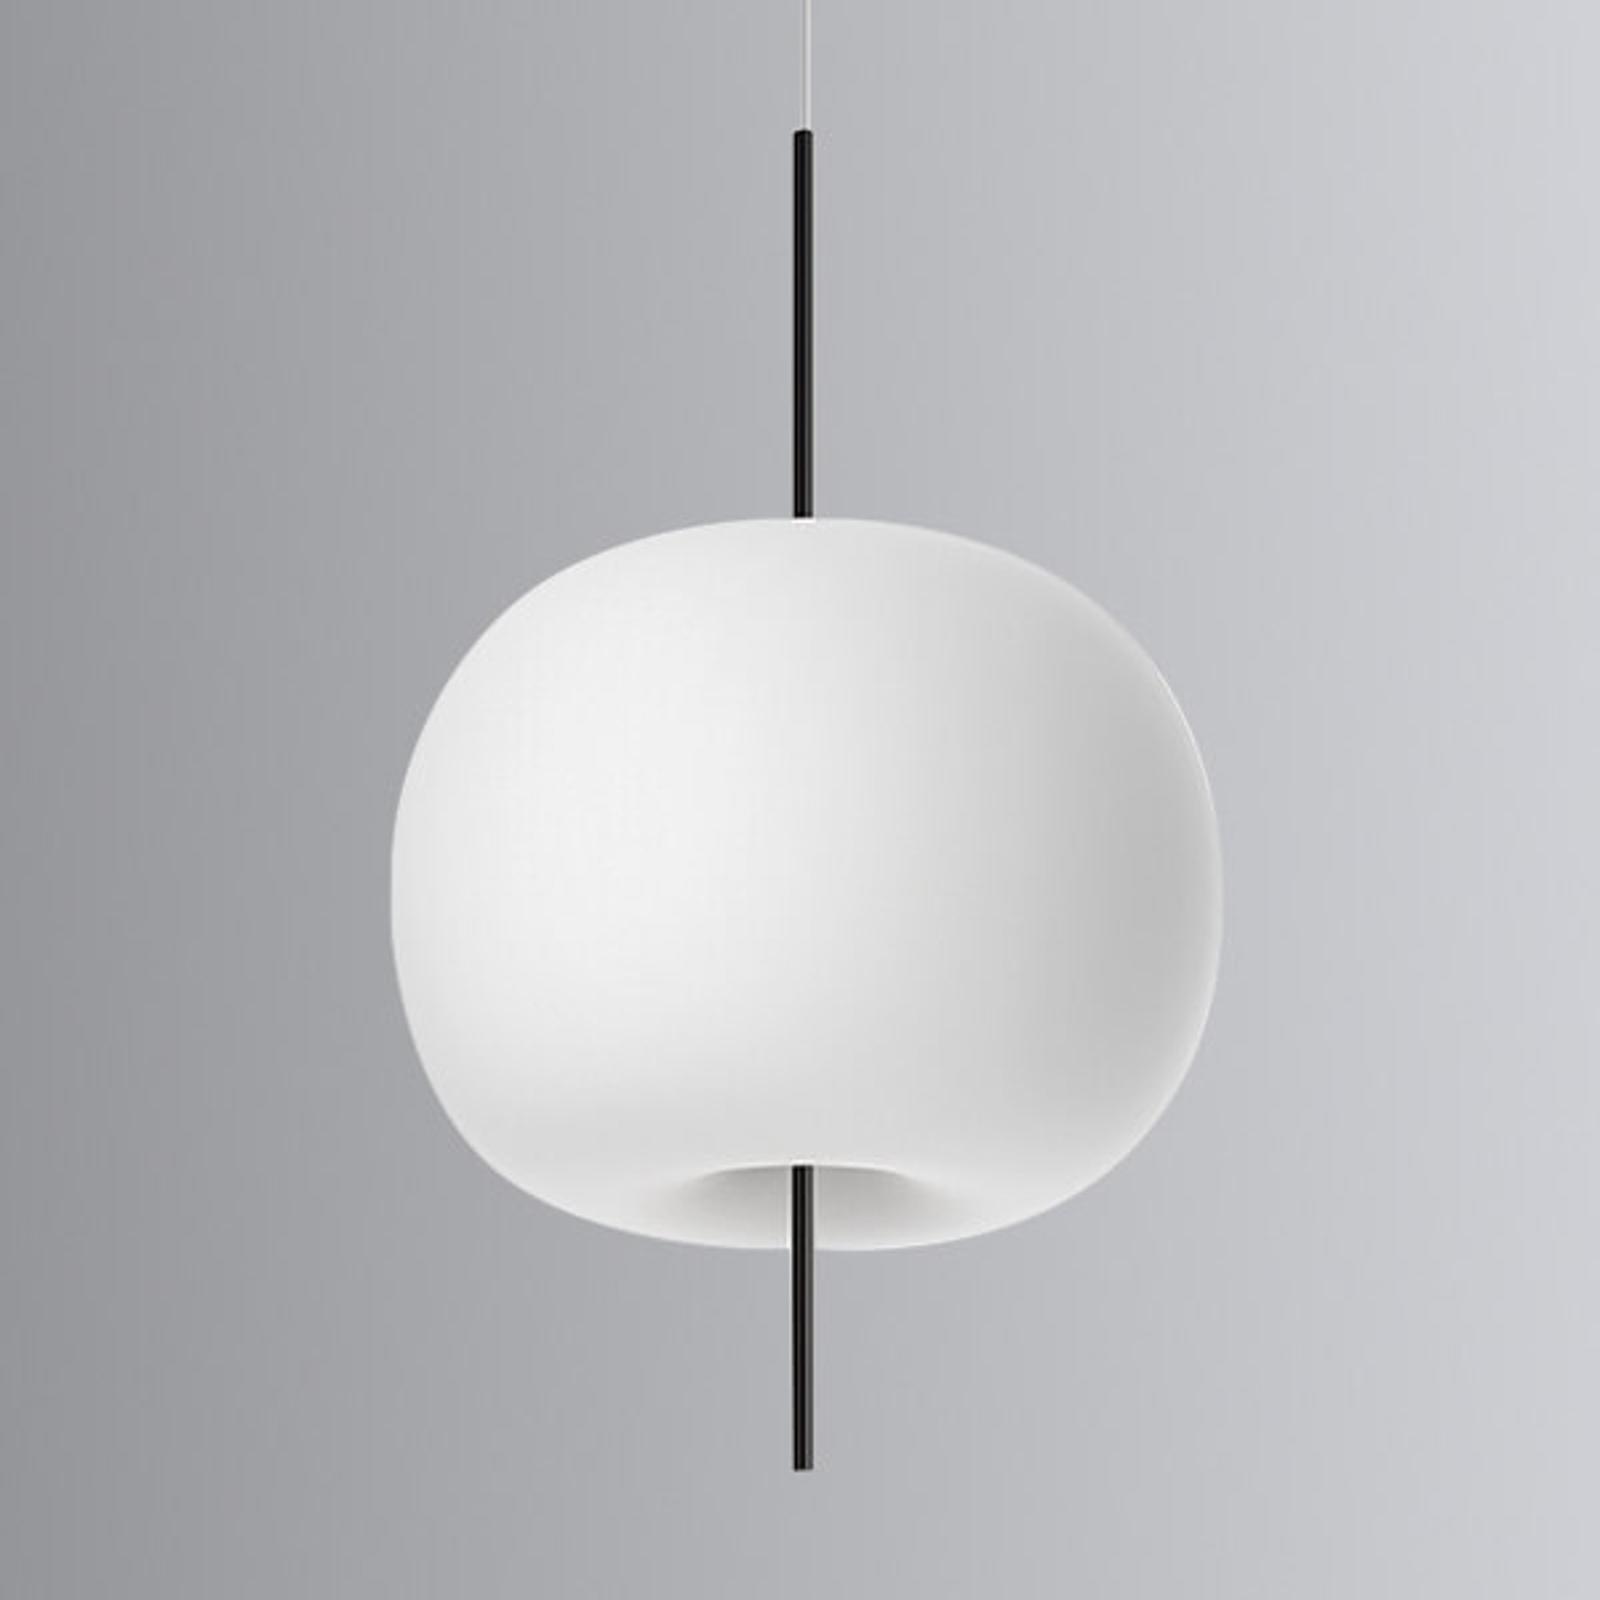 Okrągła designerska lampa wisząca LED Kushi, 33cm